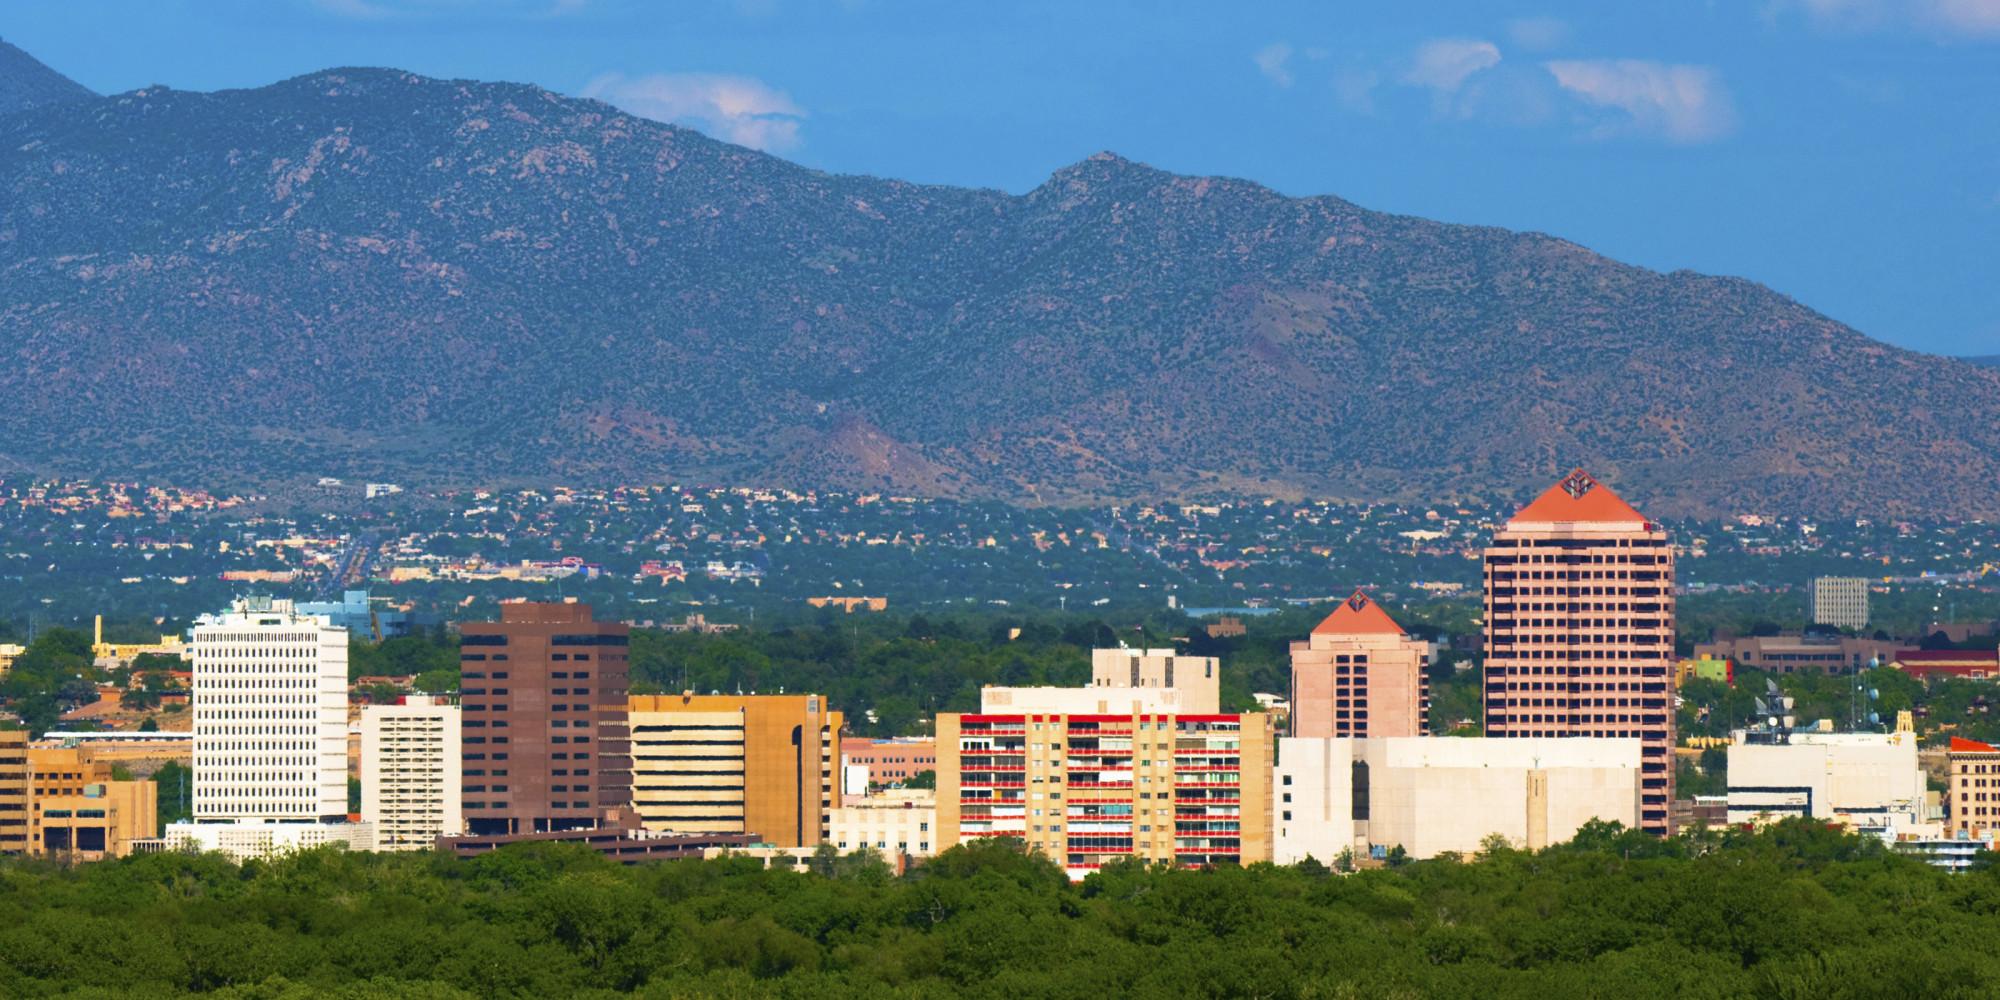 Albuquerque: Small Town, Big-City Vibe - Jewish Exponent